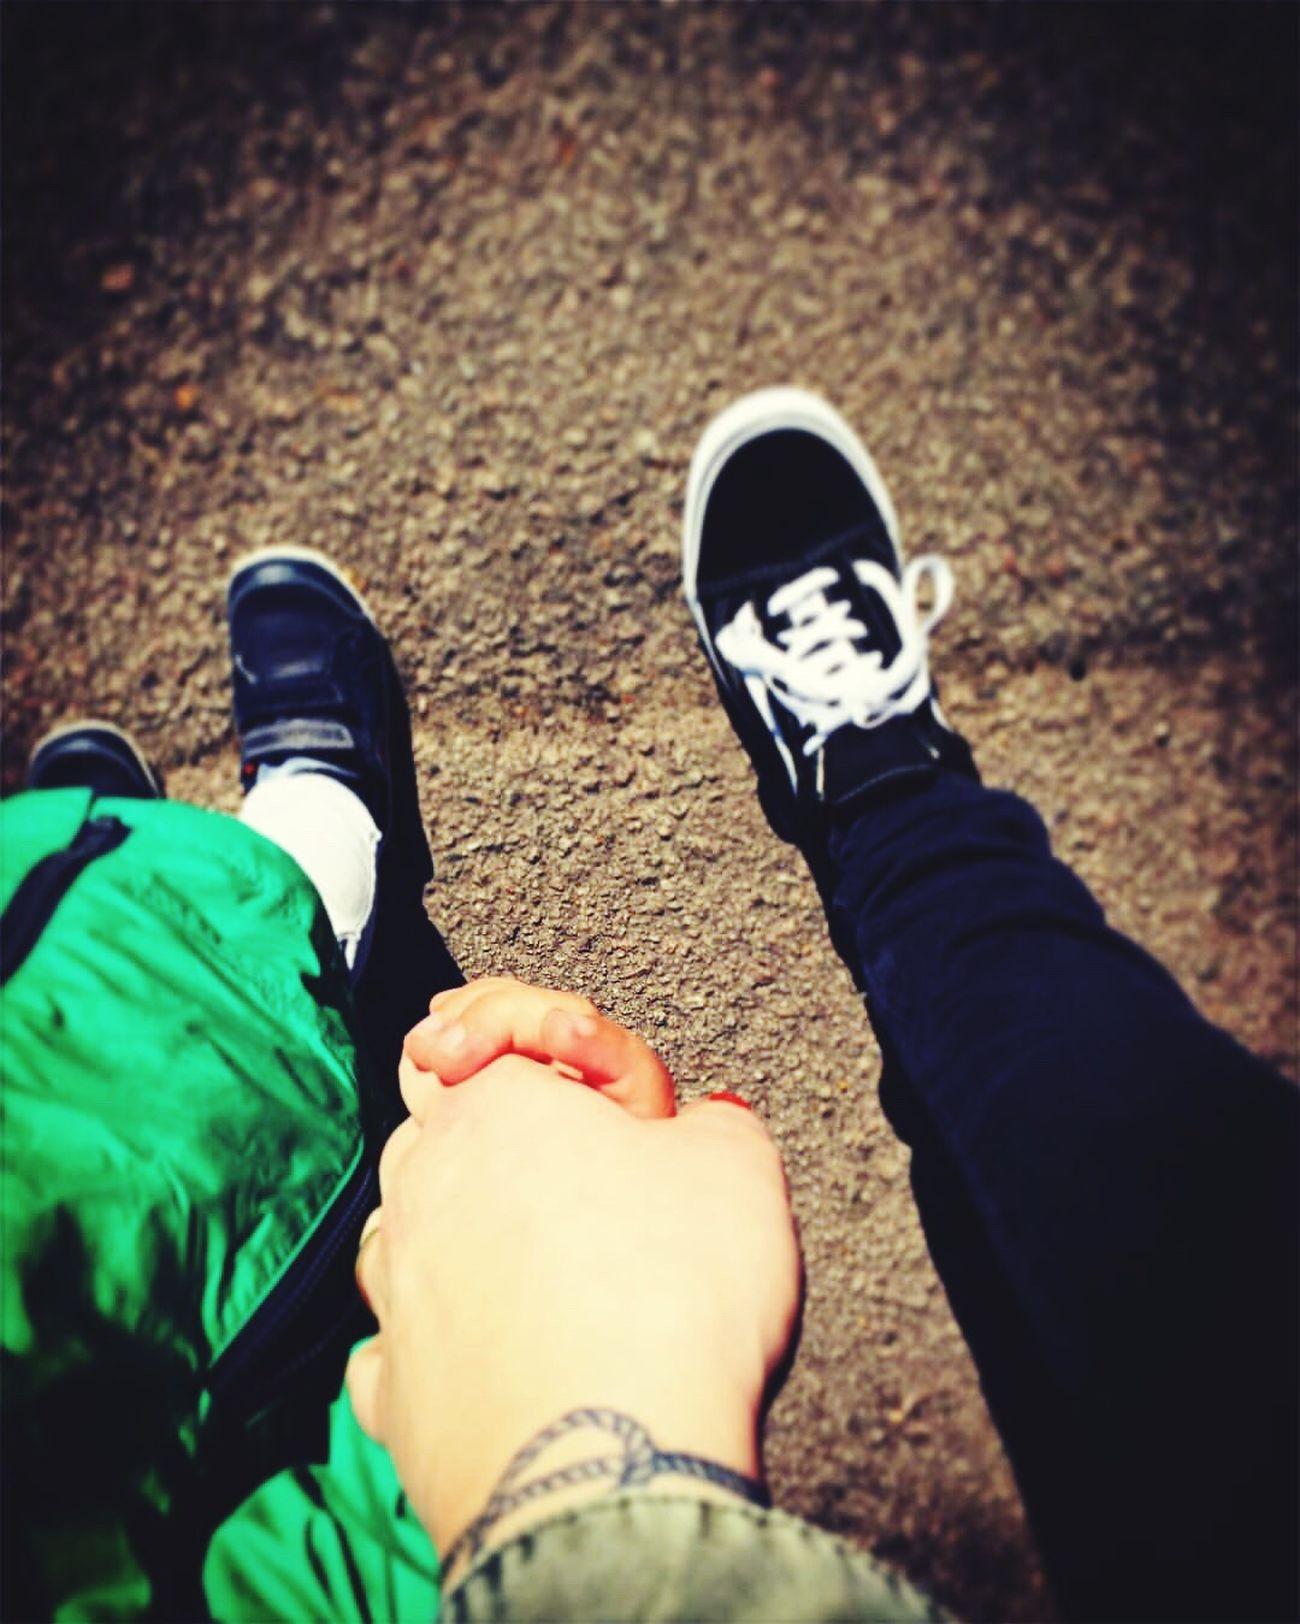 Se sentir important à travers les yeux d'un enfant. ❤️ Kid Enfant Au Pair Love Feel Important Check This Out Hanging Out Hands Tattoo Vans Holding Hands Baby Little Boy Happiness